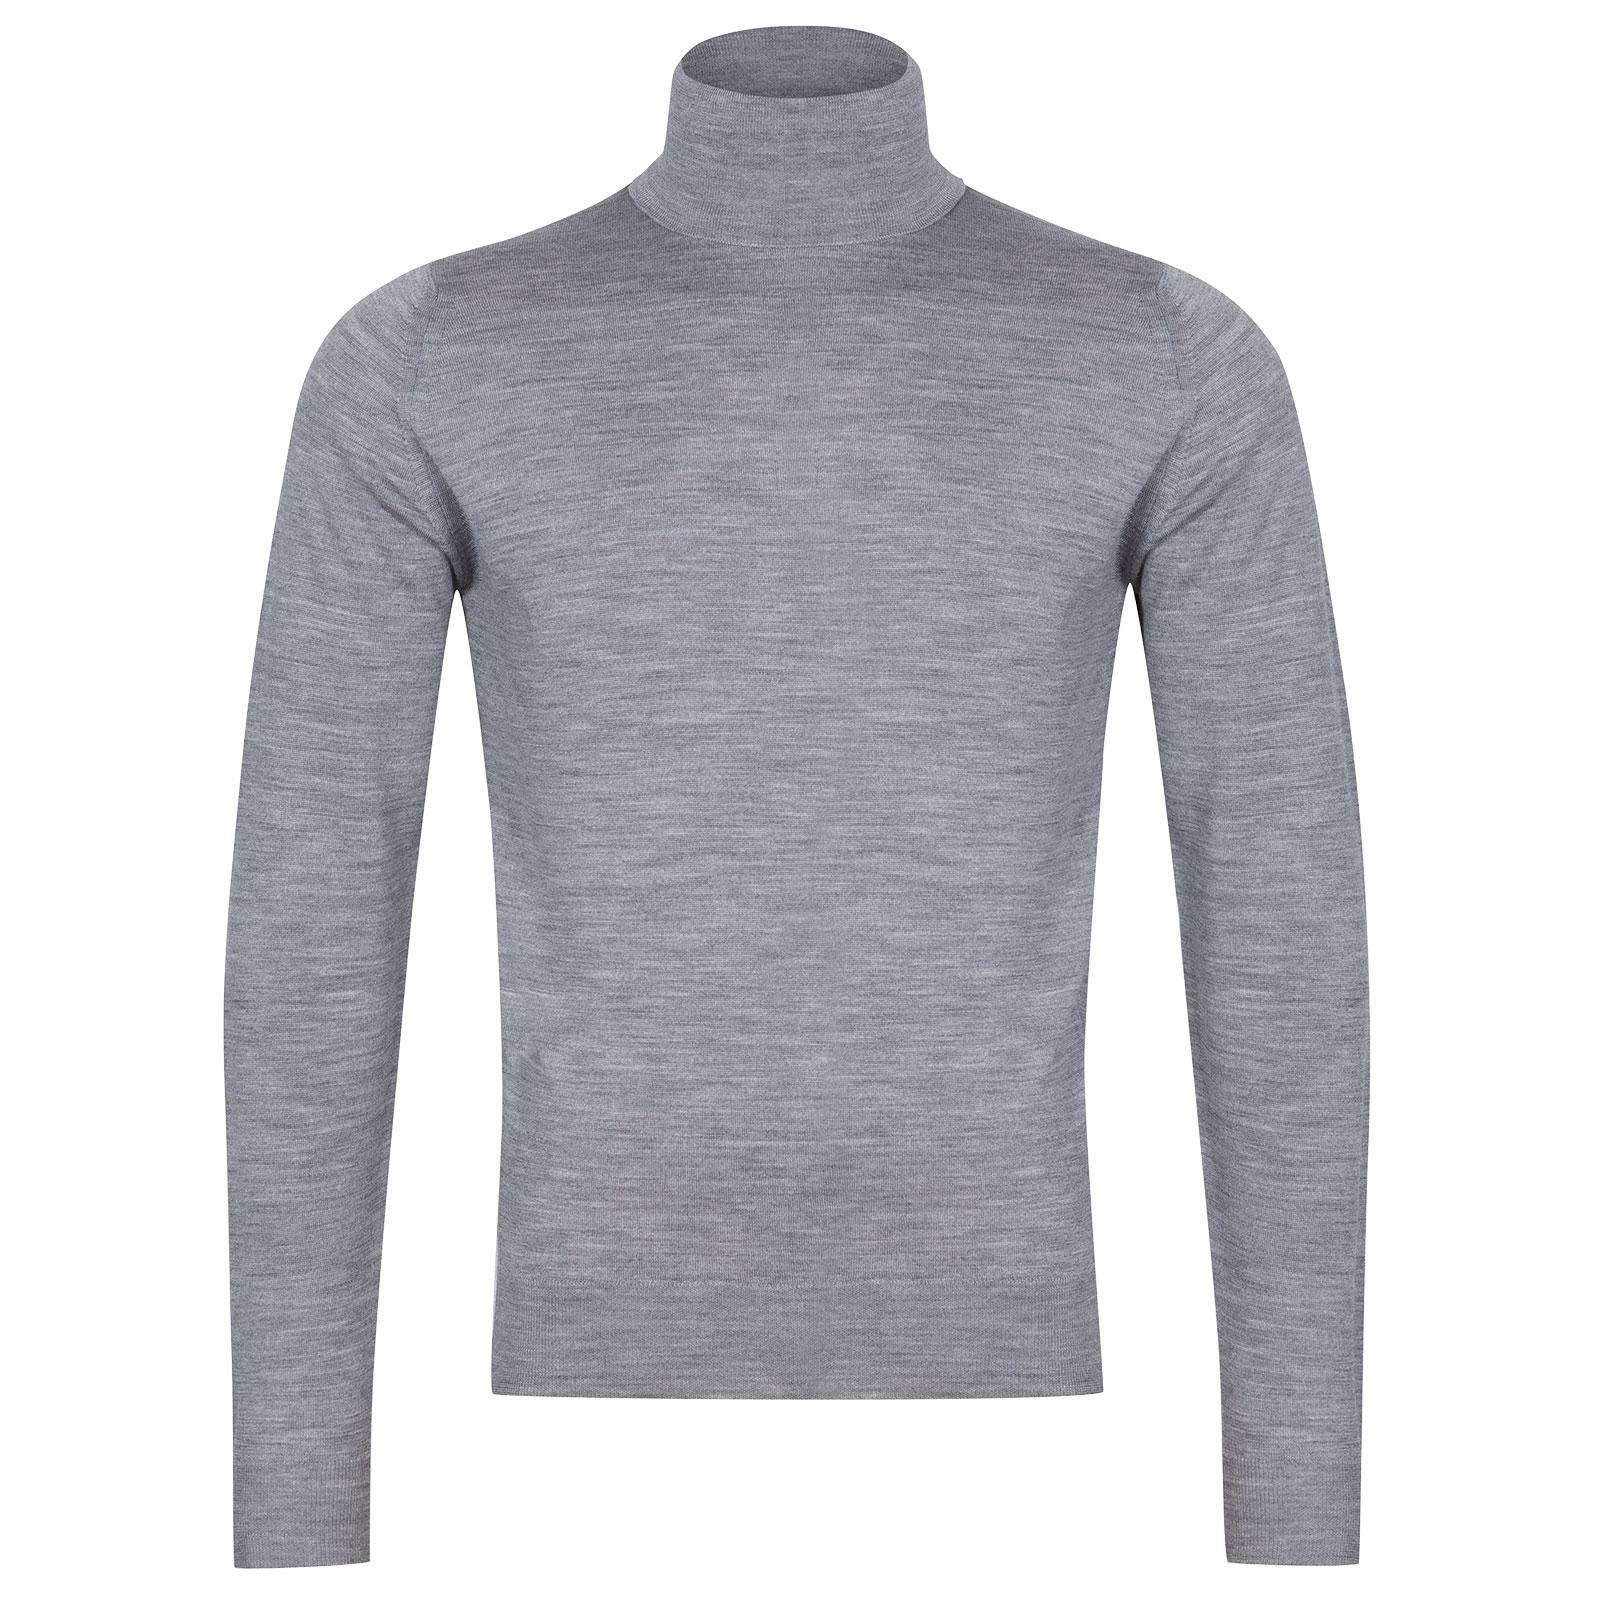 John Smedley Orta Merino Wool Pullover in Silver-L